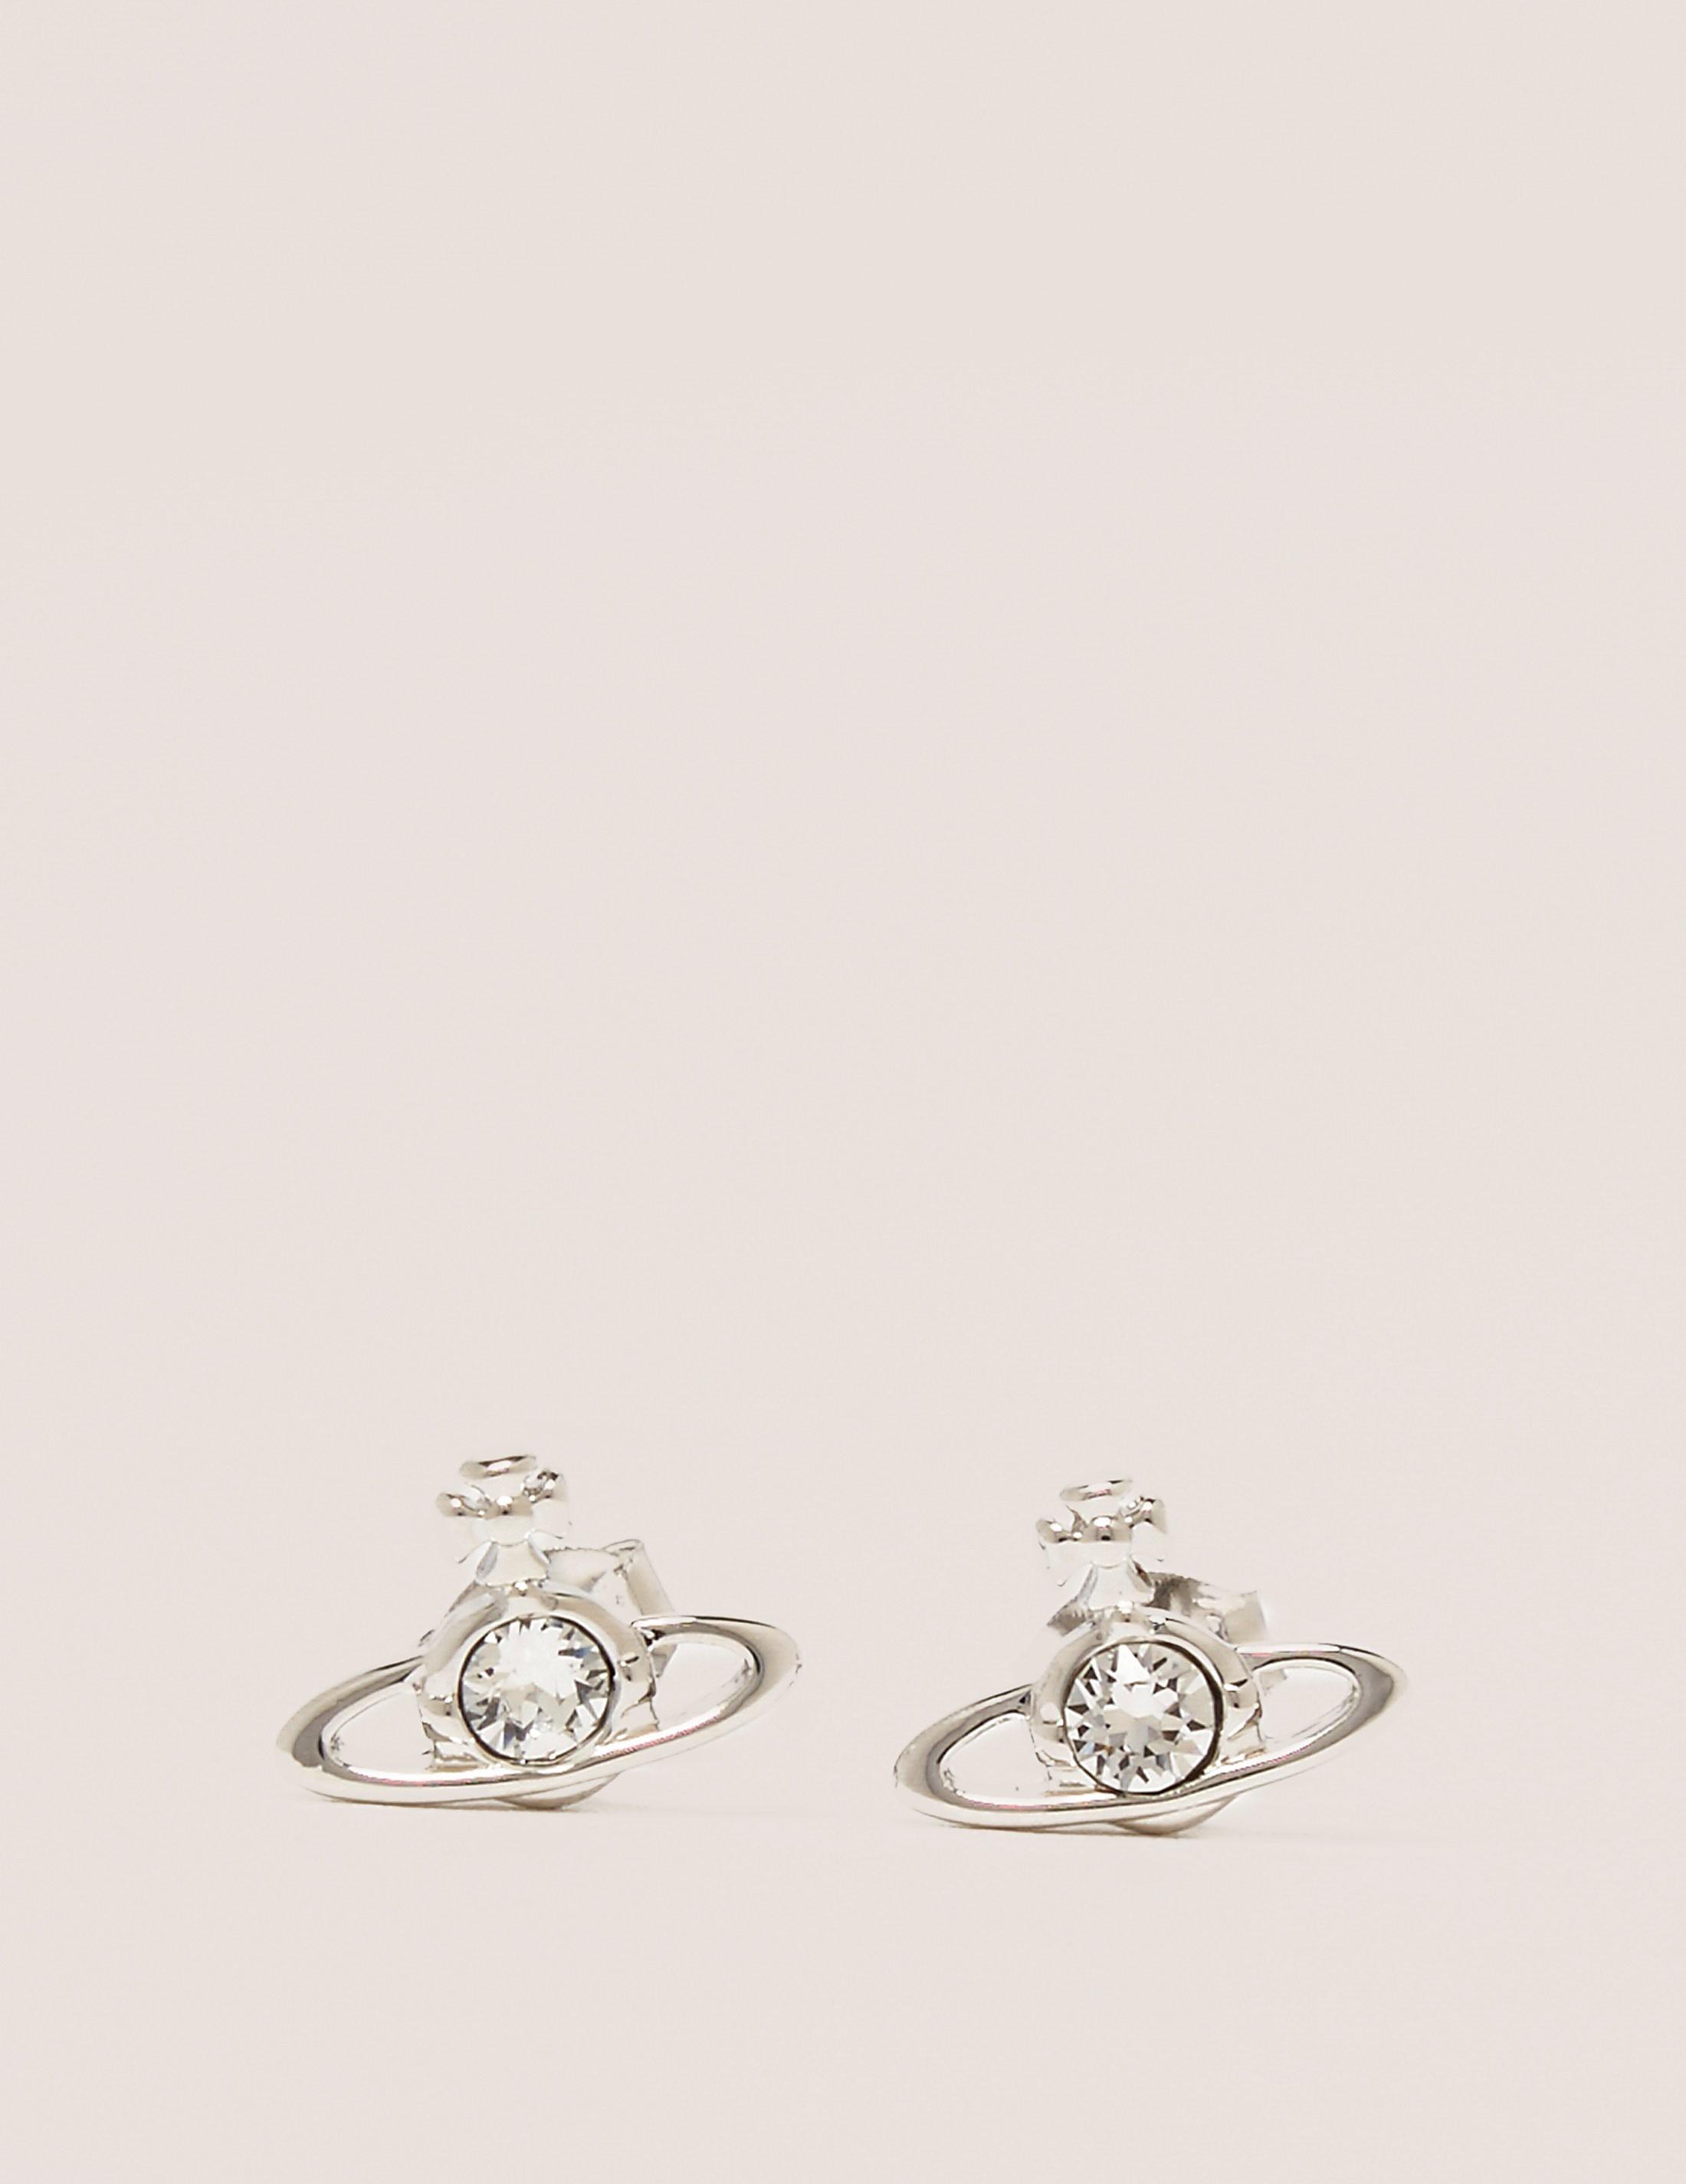 Vivienne Westwood Nano Solitare Earrings